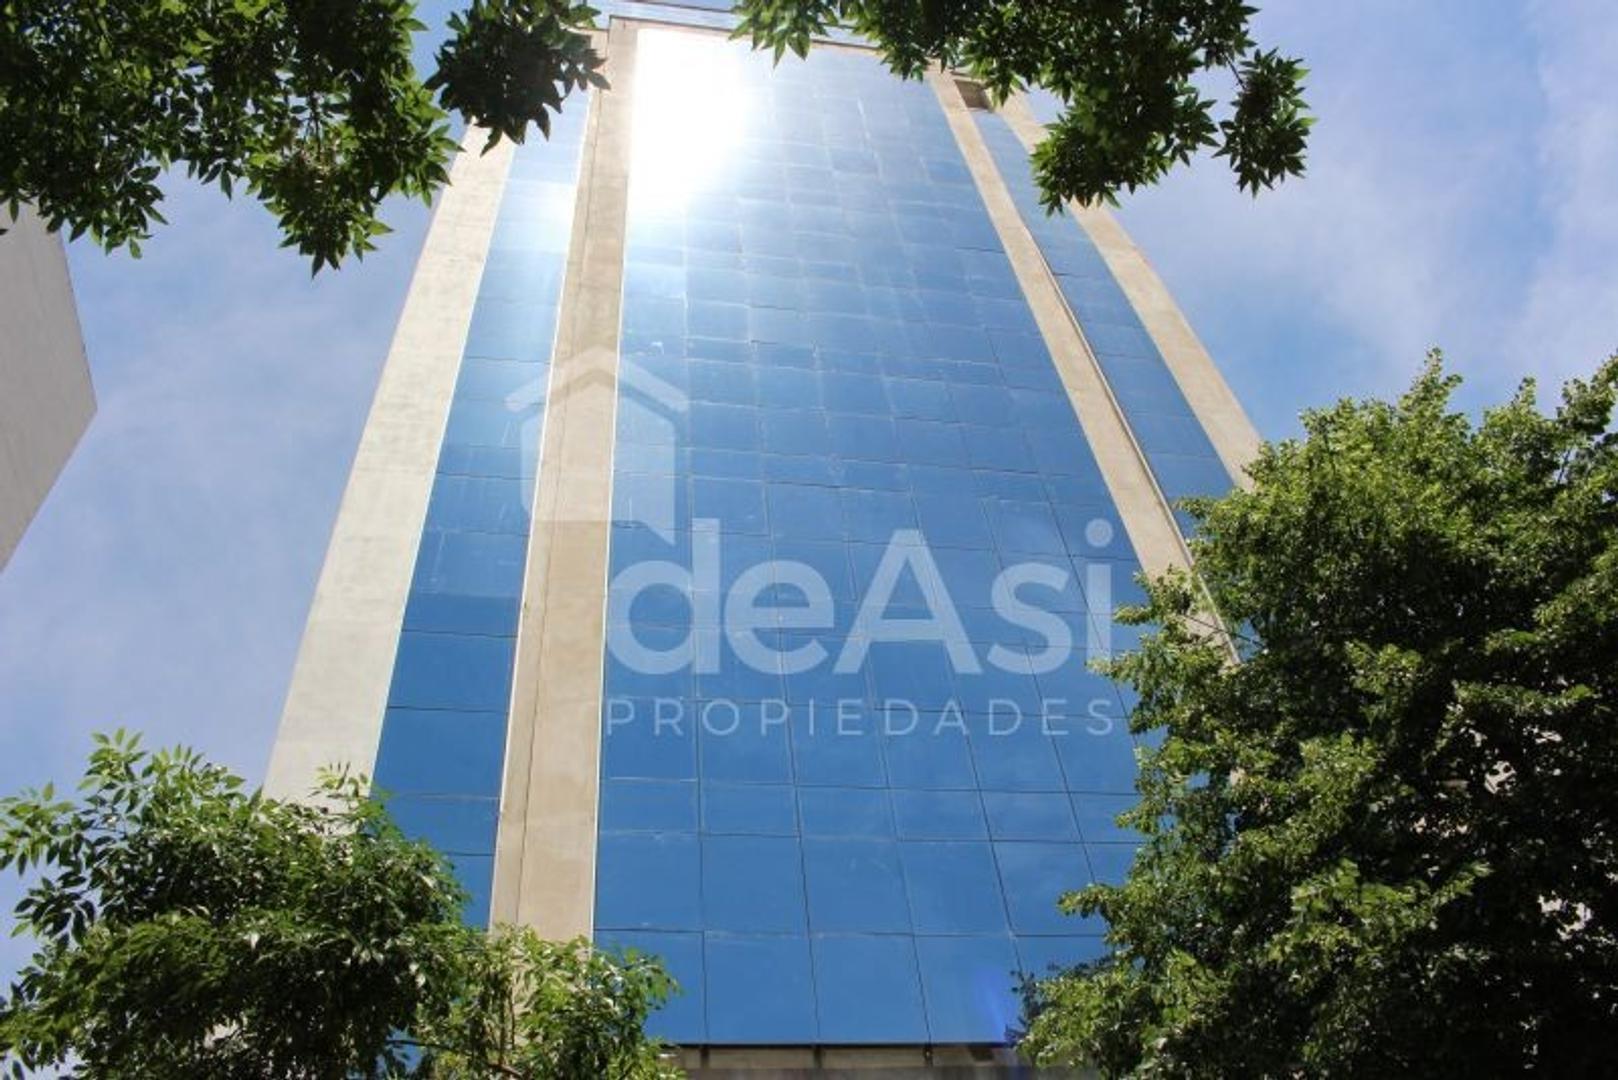 XINTEL(MDA-MDA-560) Departamento - Venta - Argentina, La Plata - 46  AL 900